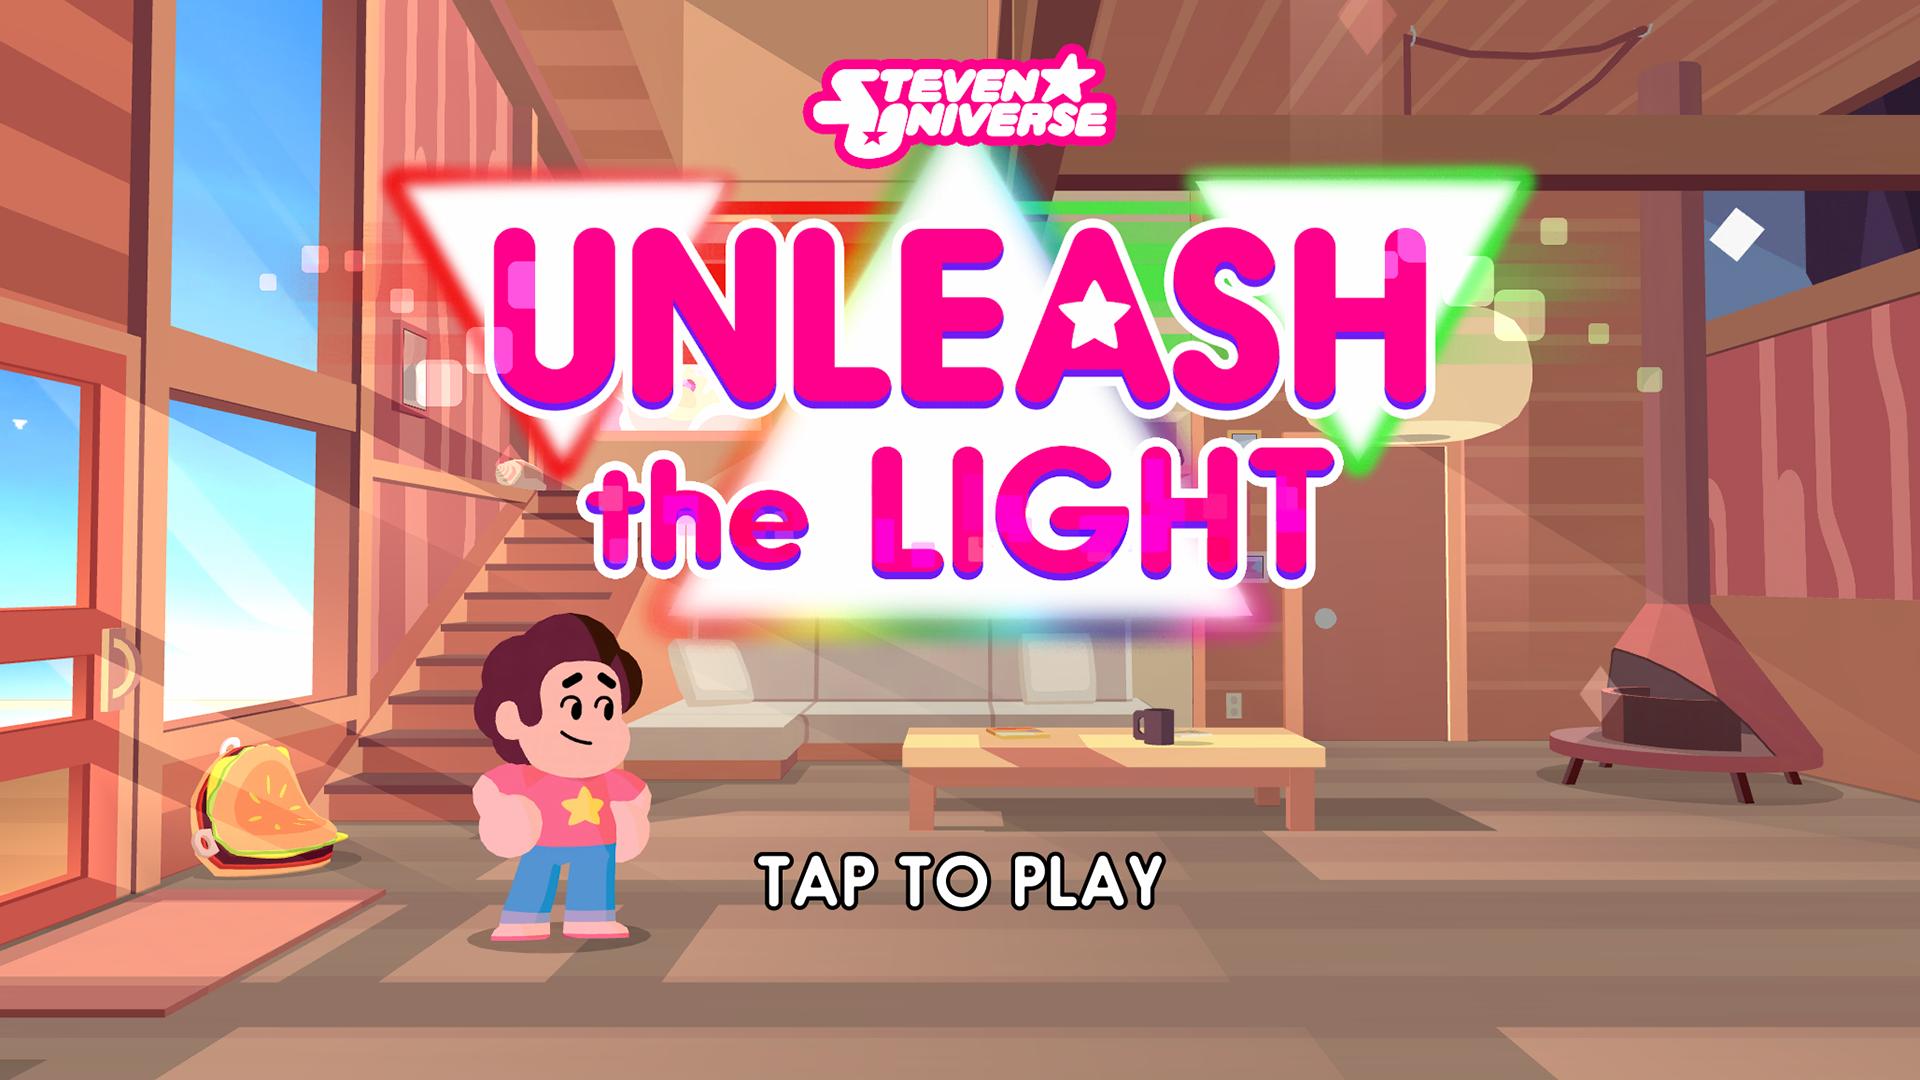 Roblox On Apple Arcade Steven Universe Unleash The Light On Apple Arcade A Superparent